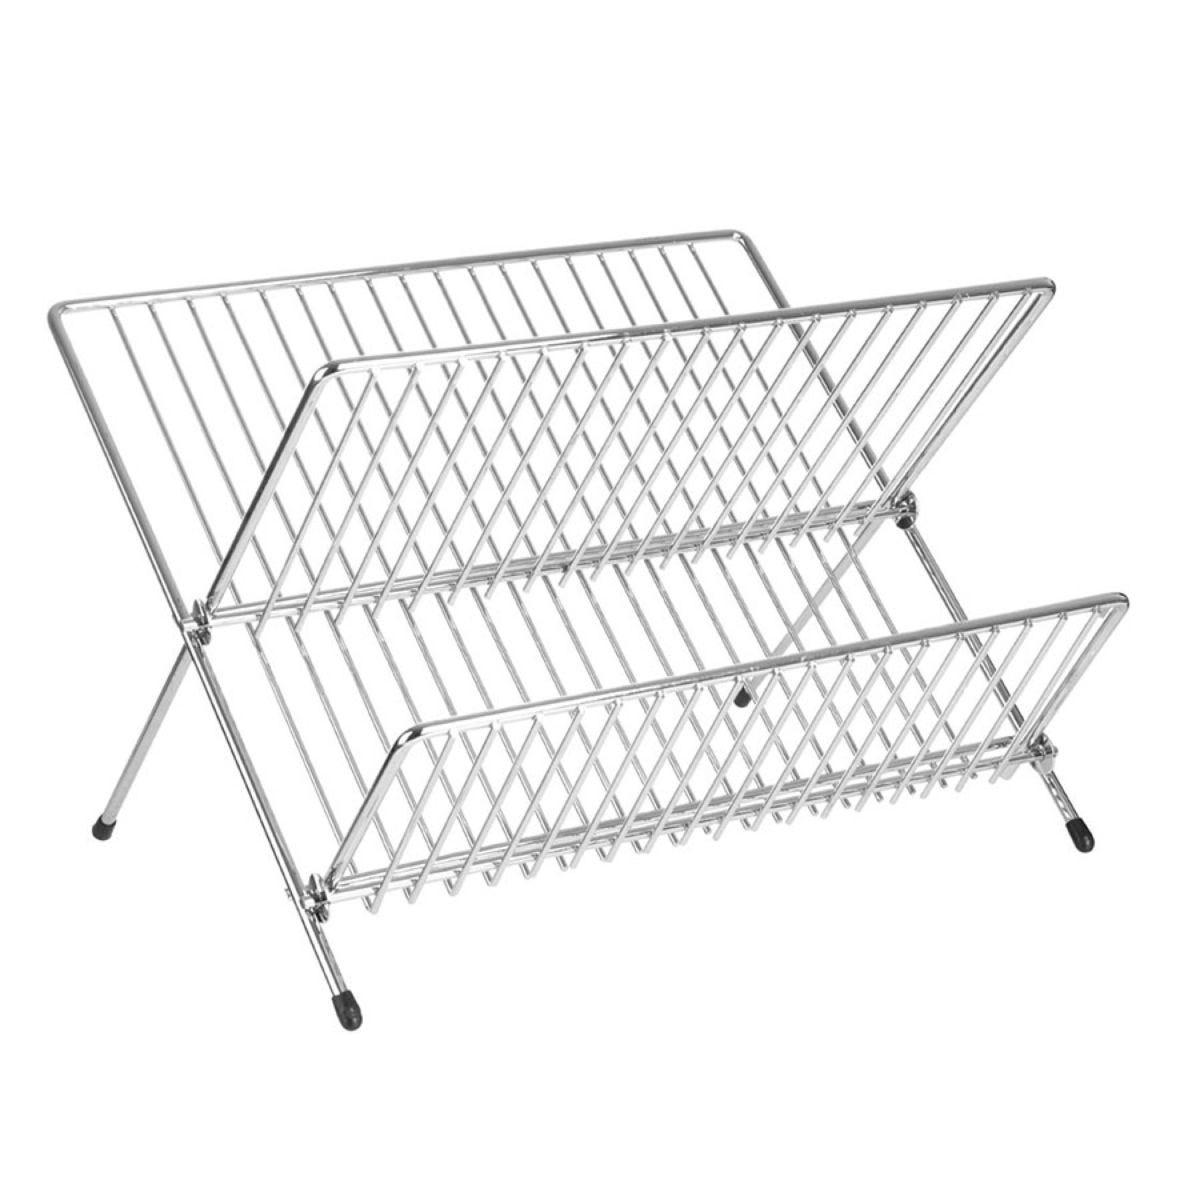 Premier Housewares Folding Dish Drainer - Chrome